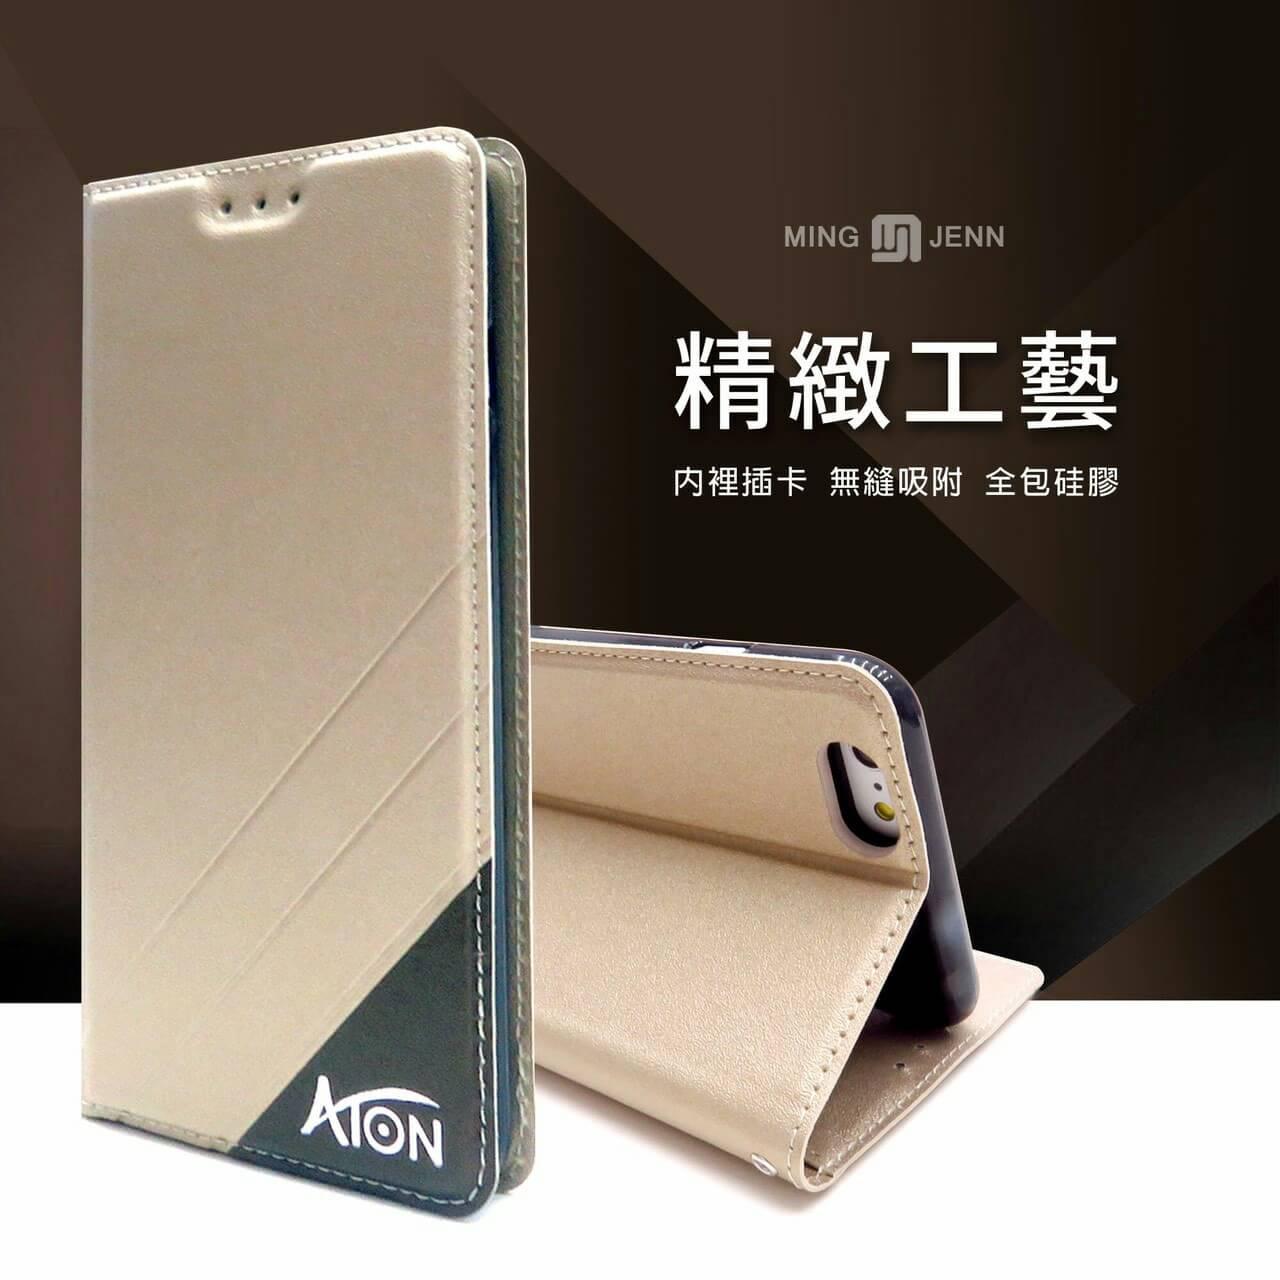 ATON 鐵塔系列 SAMSUNG Galaxy Note 20 手機皮套 隱扣 側翻皮套 可立式 可插卡 含內袋 手機套 保護殼 保護套